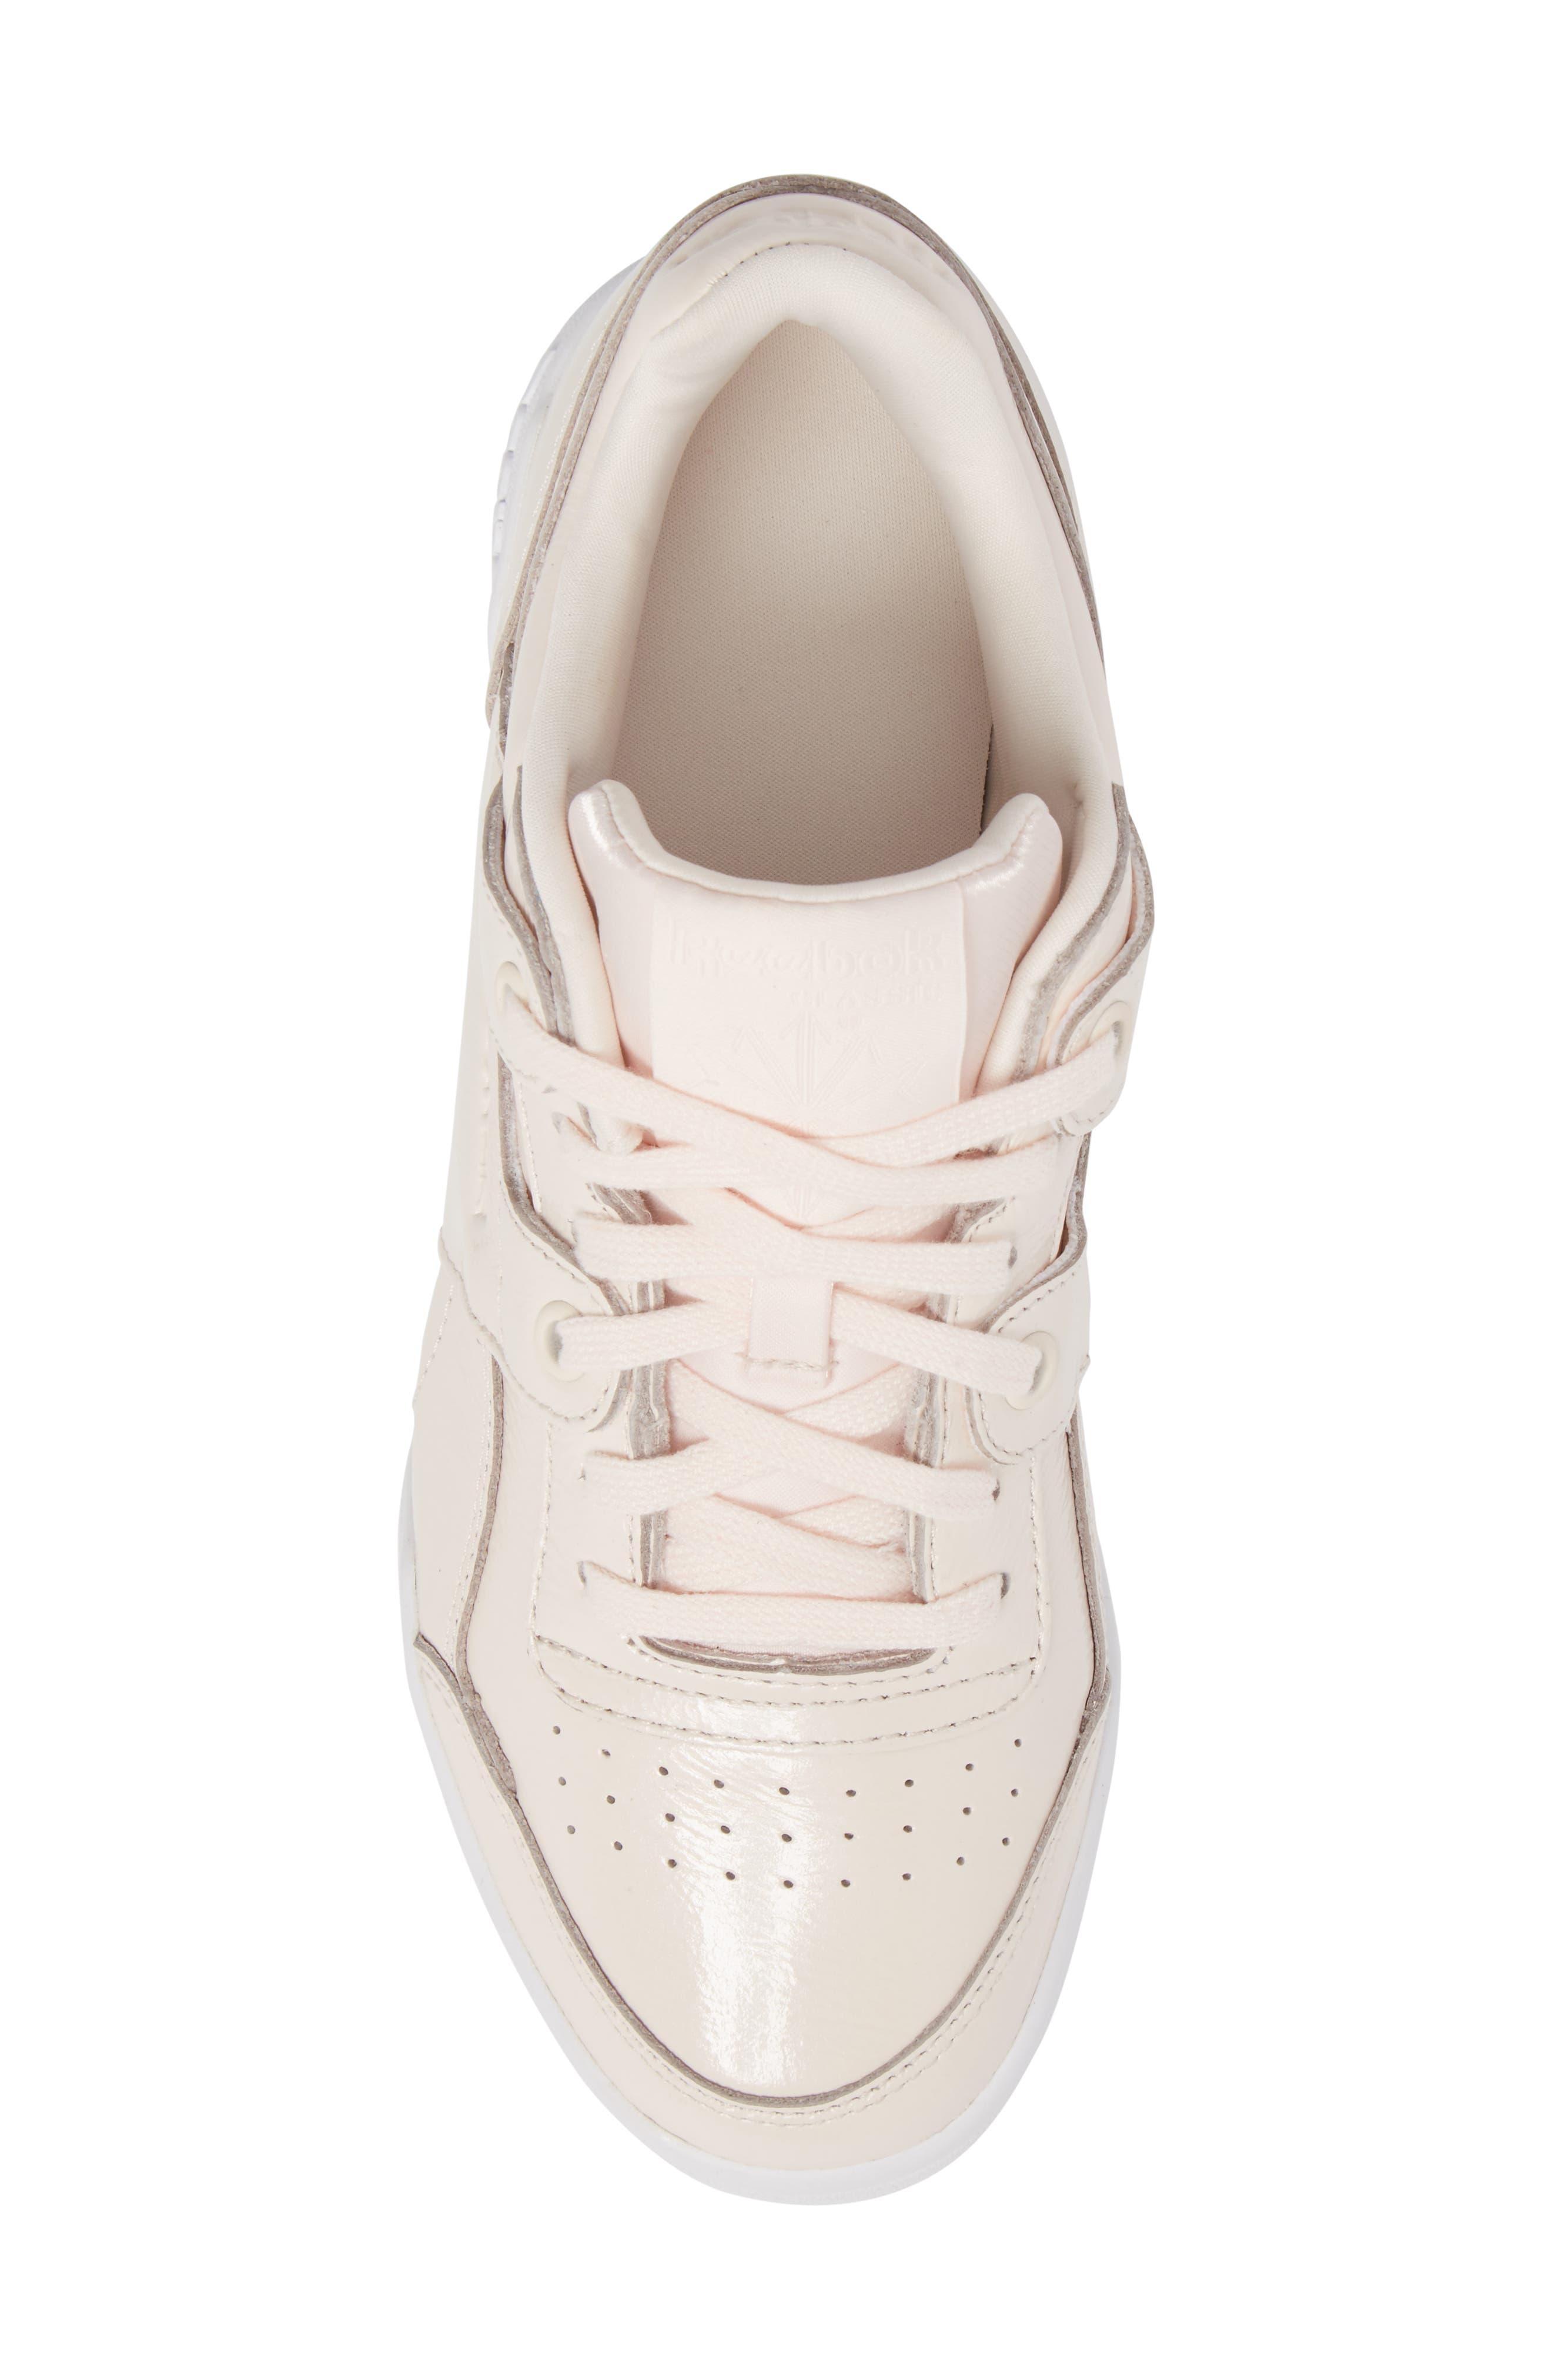 Workout Lo Plus Iridescent Sneaker,                             Alternate thumbnail 5, color,                             650